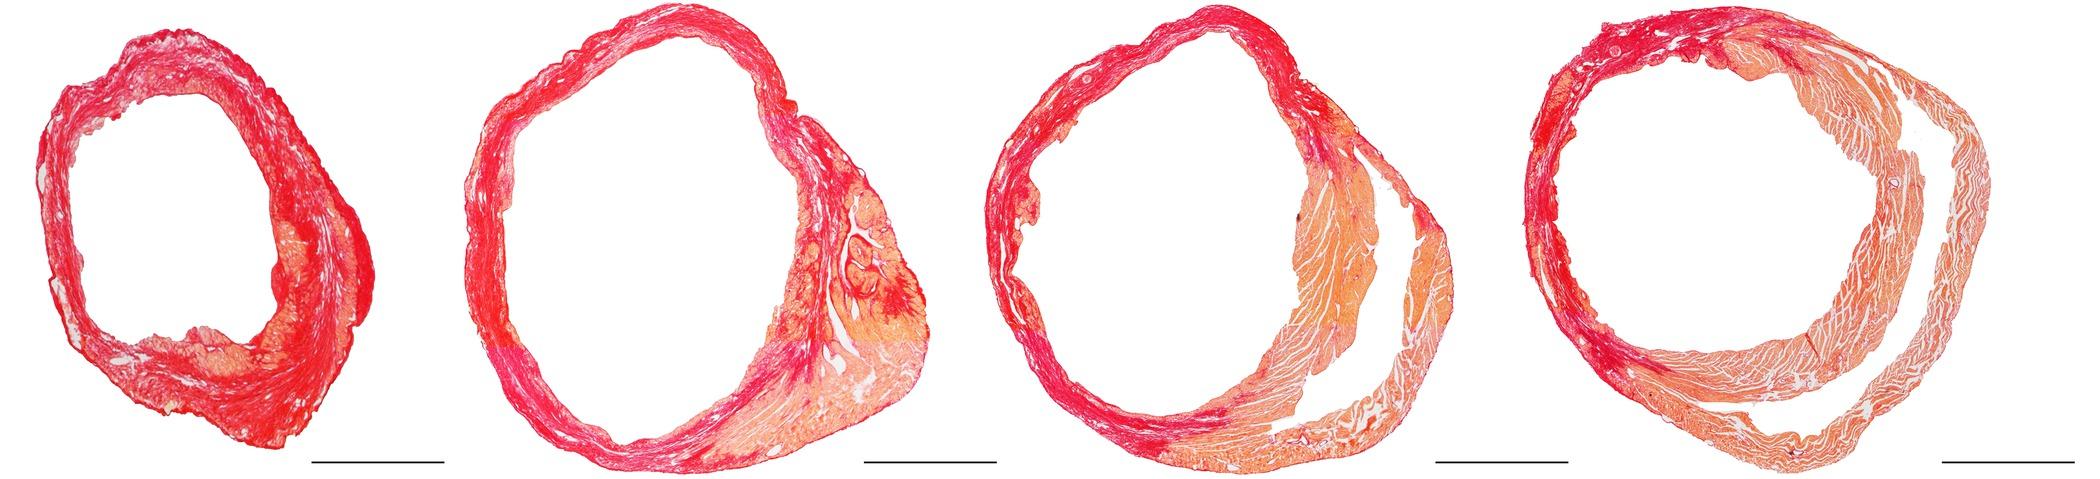 Permanent Ligation Of The Left Anterior Descending Coronary Artery